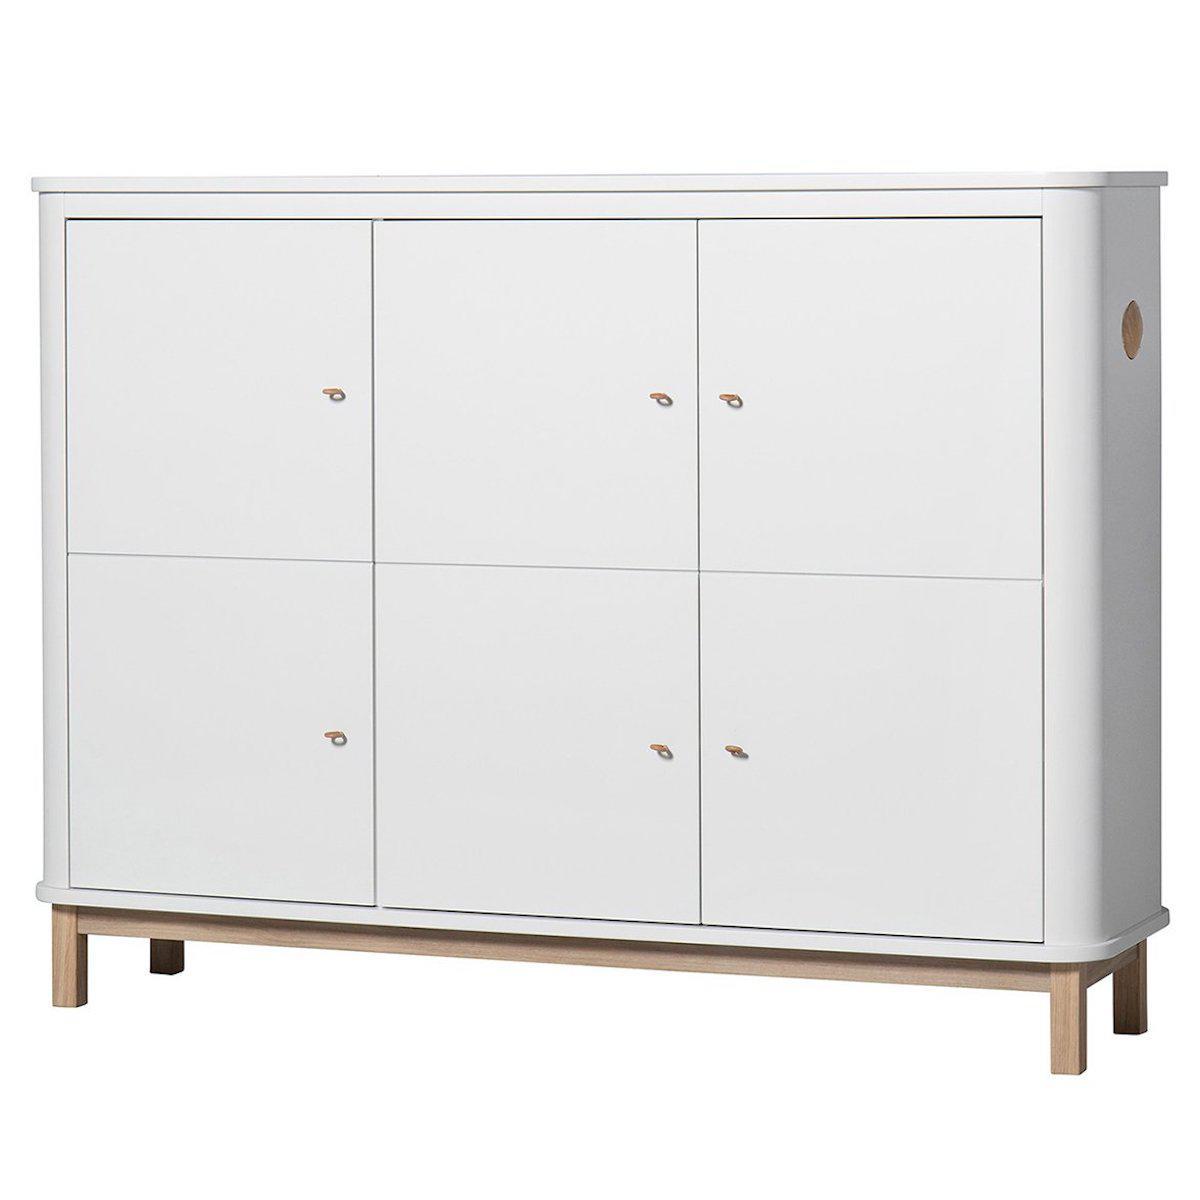 Armoire multi-rangement 3 portes WOOD Oliver Furniture blanc-chêne